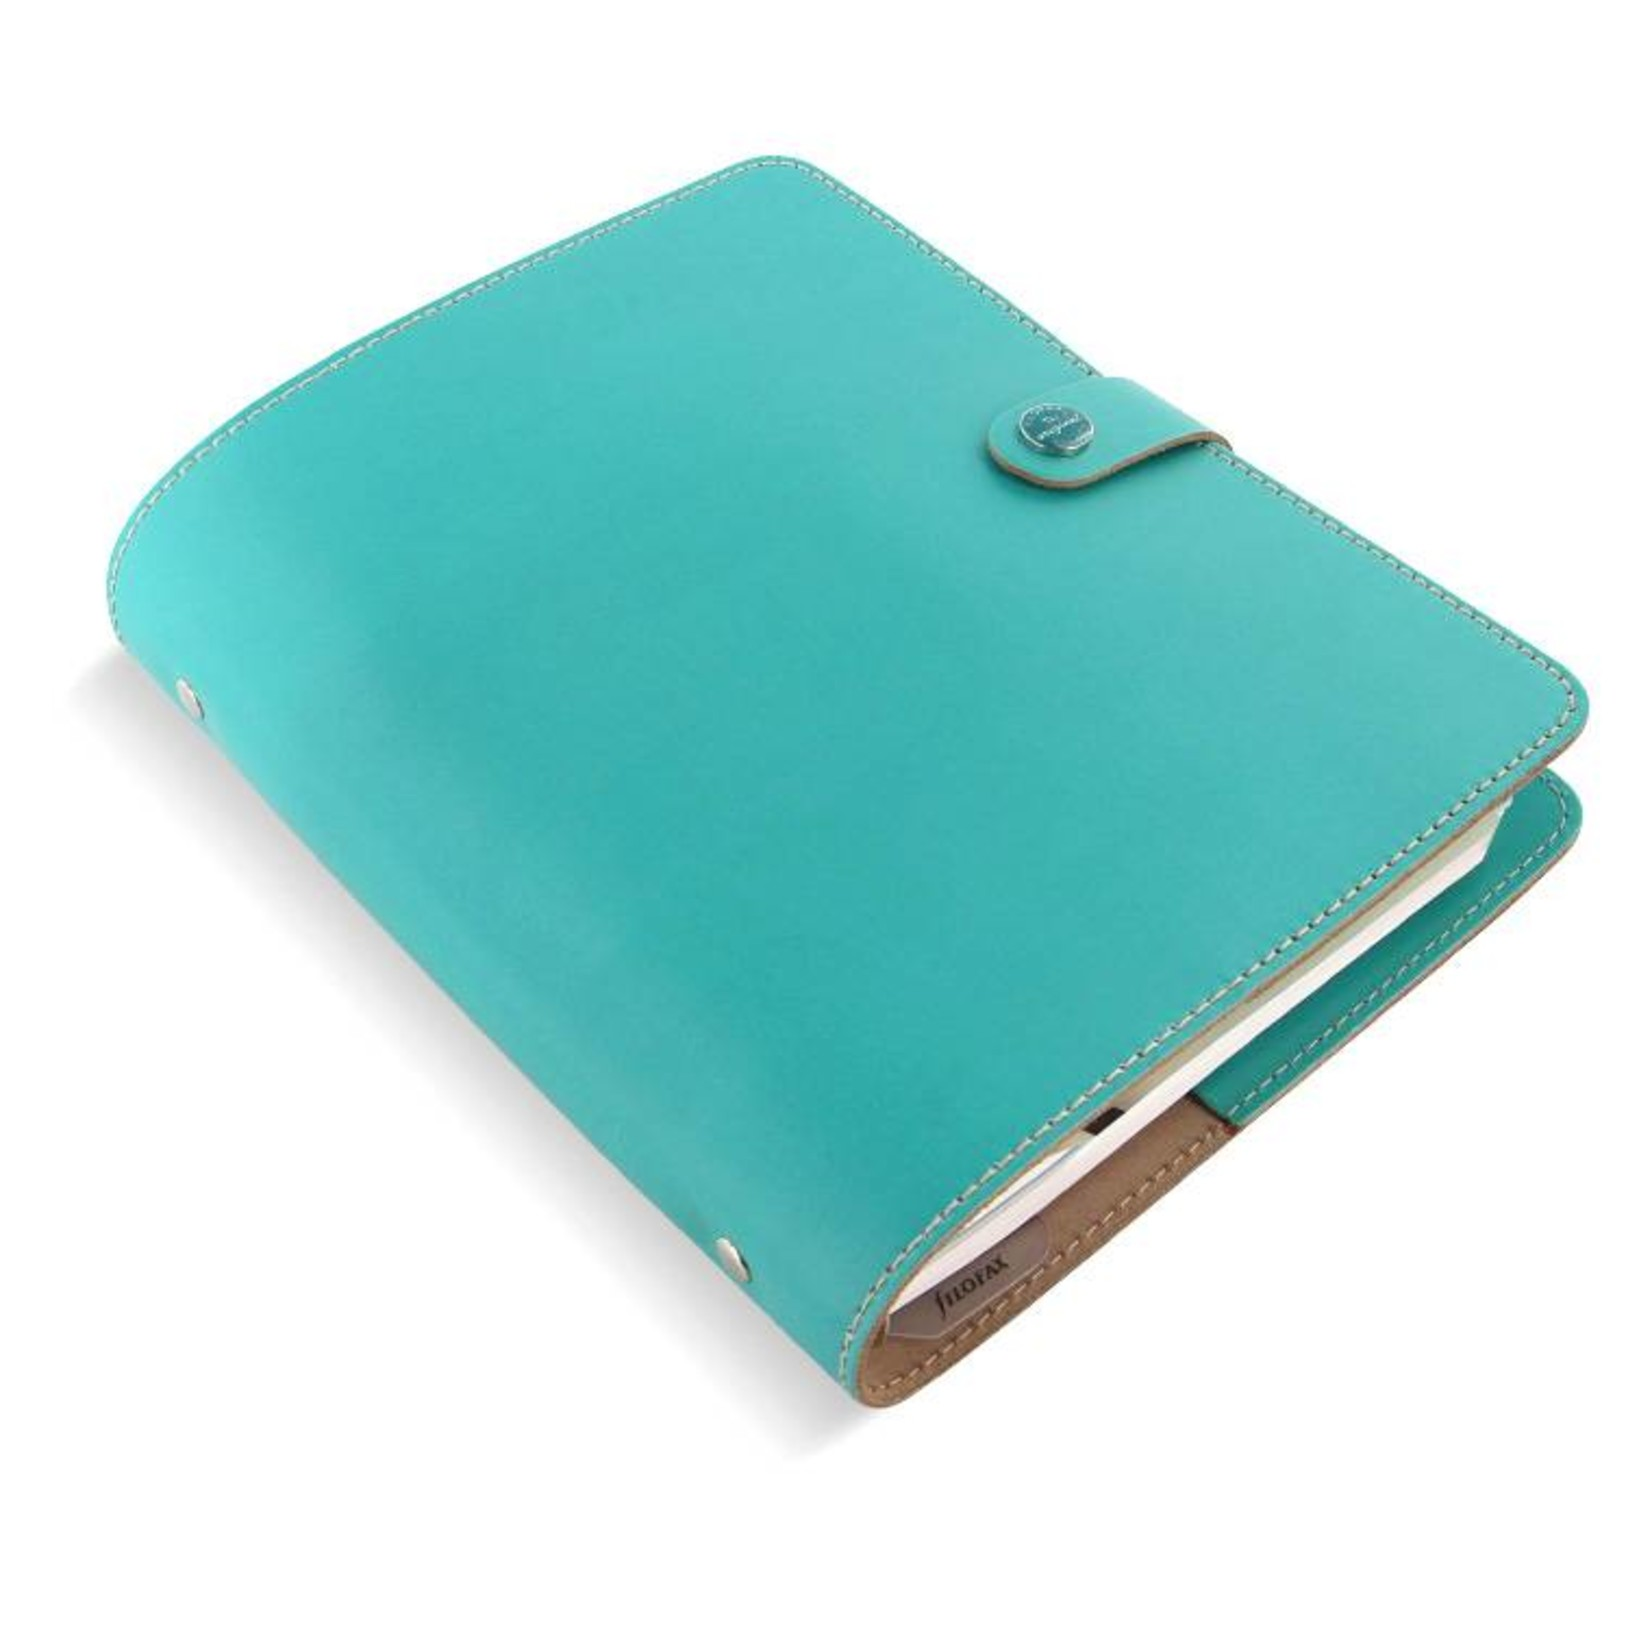 Filofax A5 THE ORIGINAL Turquoise